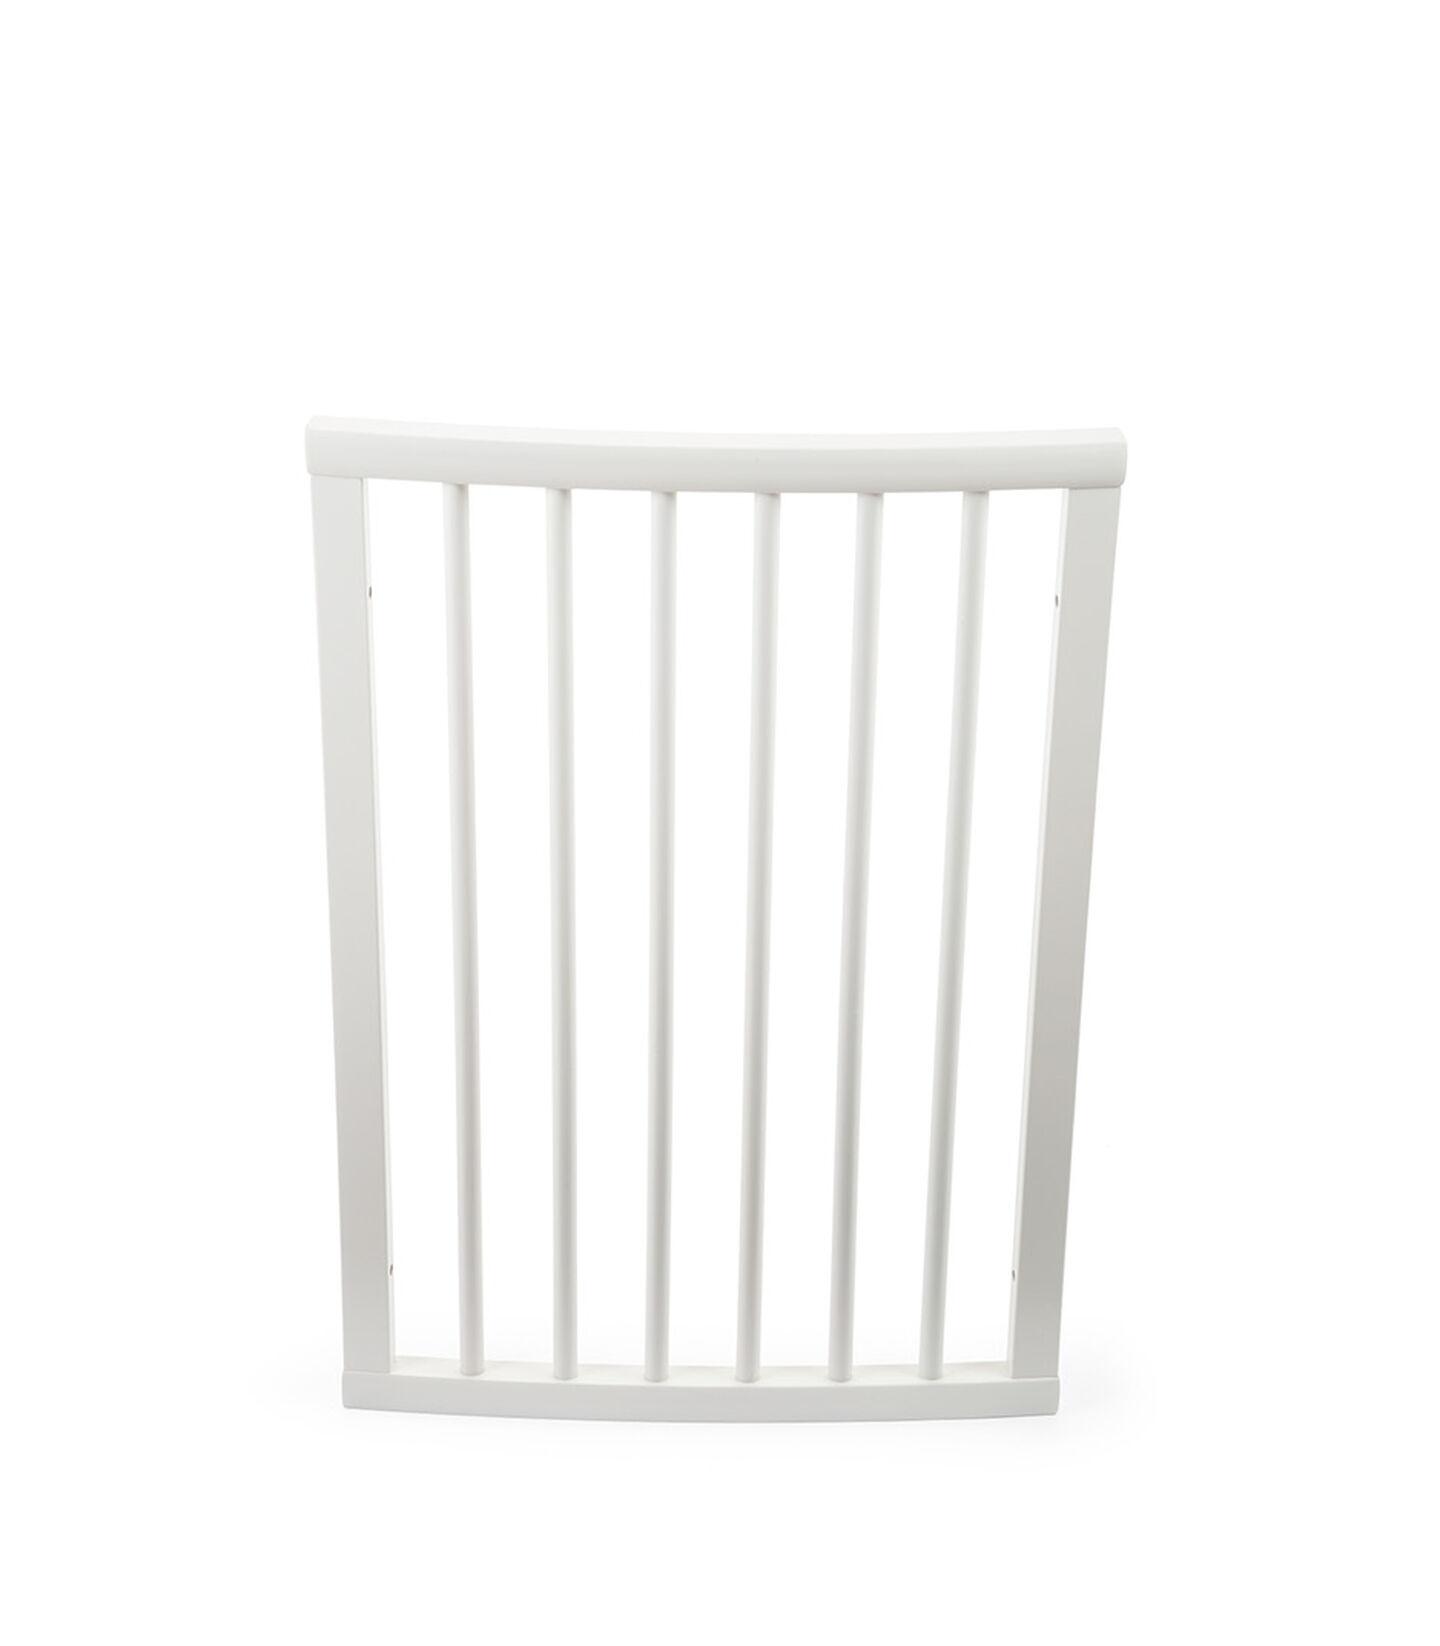 Stokke® Sleepi™ Middle section Bianco, Bianco, mainview view 1